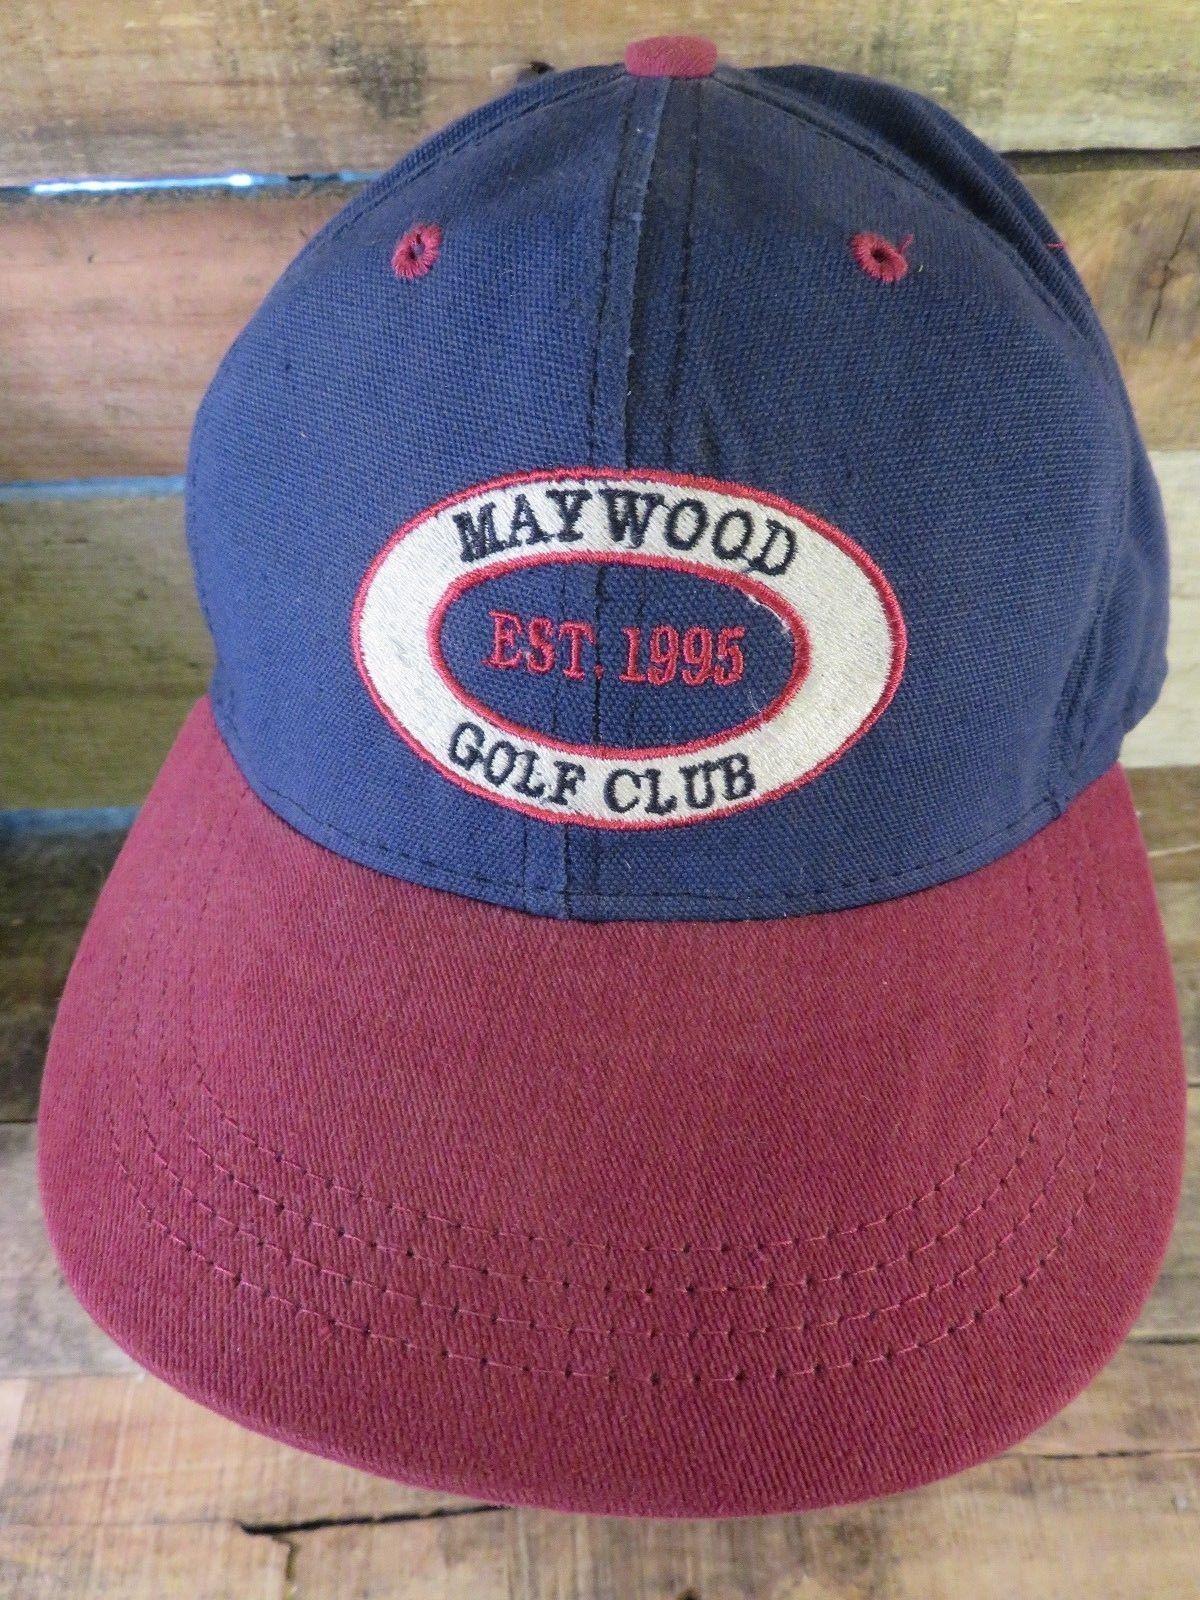 MAYWOOD Golf Club EST 1995 Adjustable Strapback Adult Hat Cap - $12.46